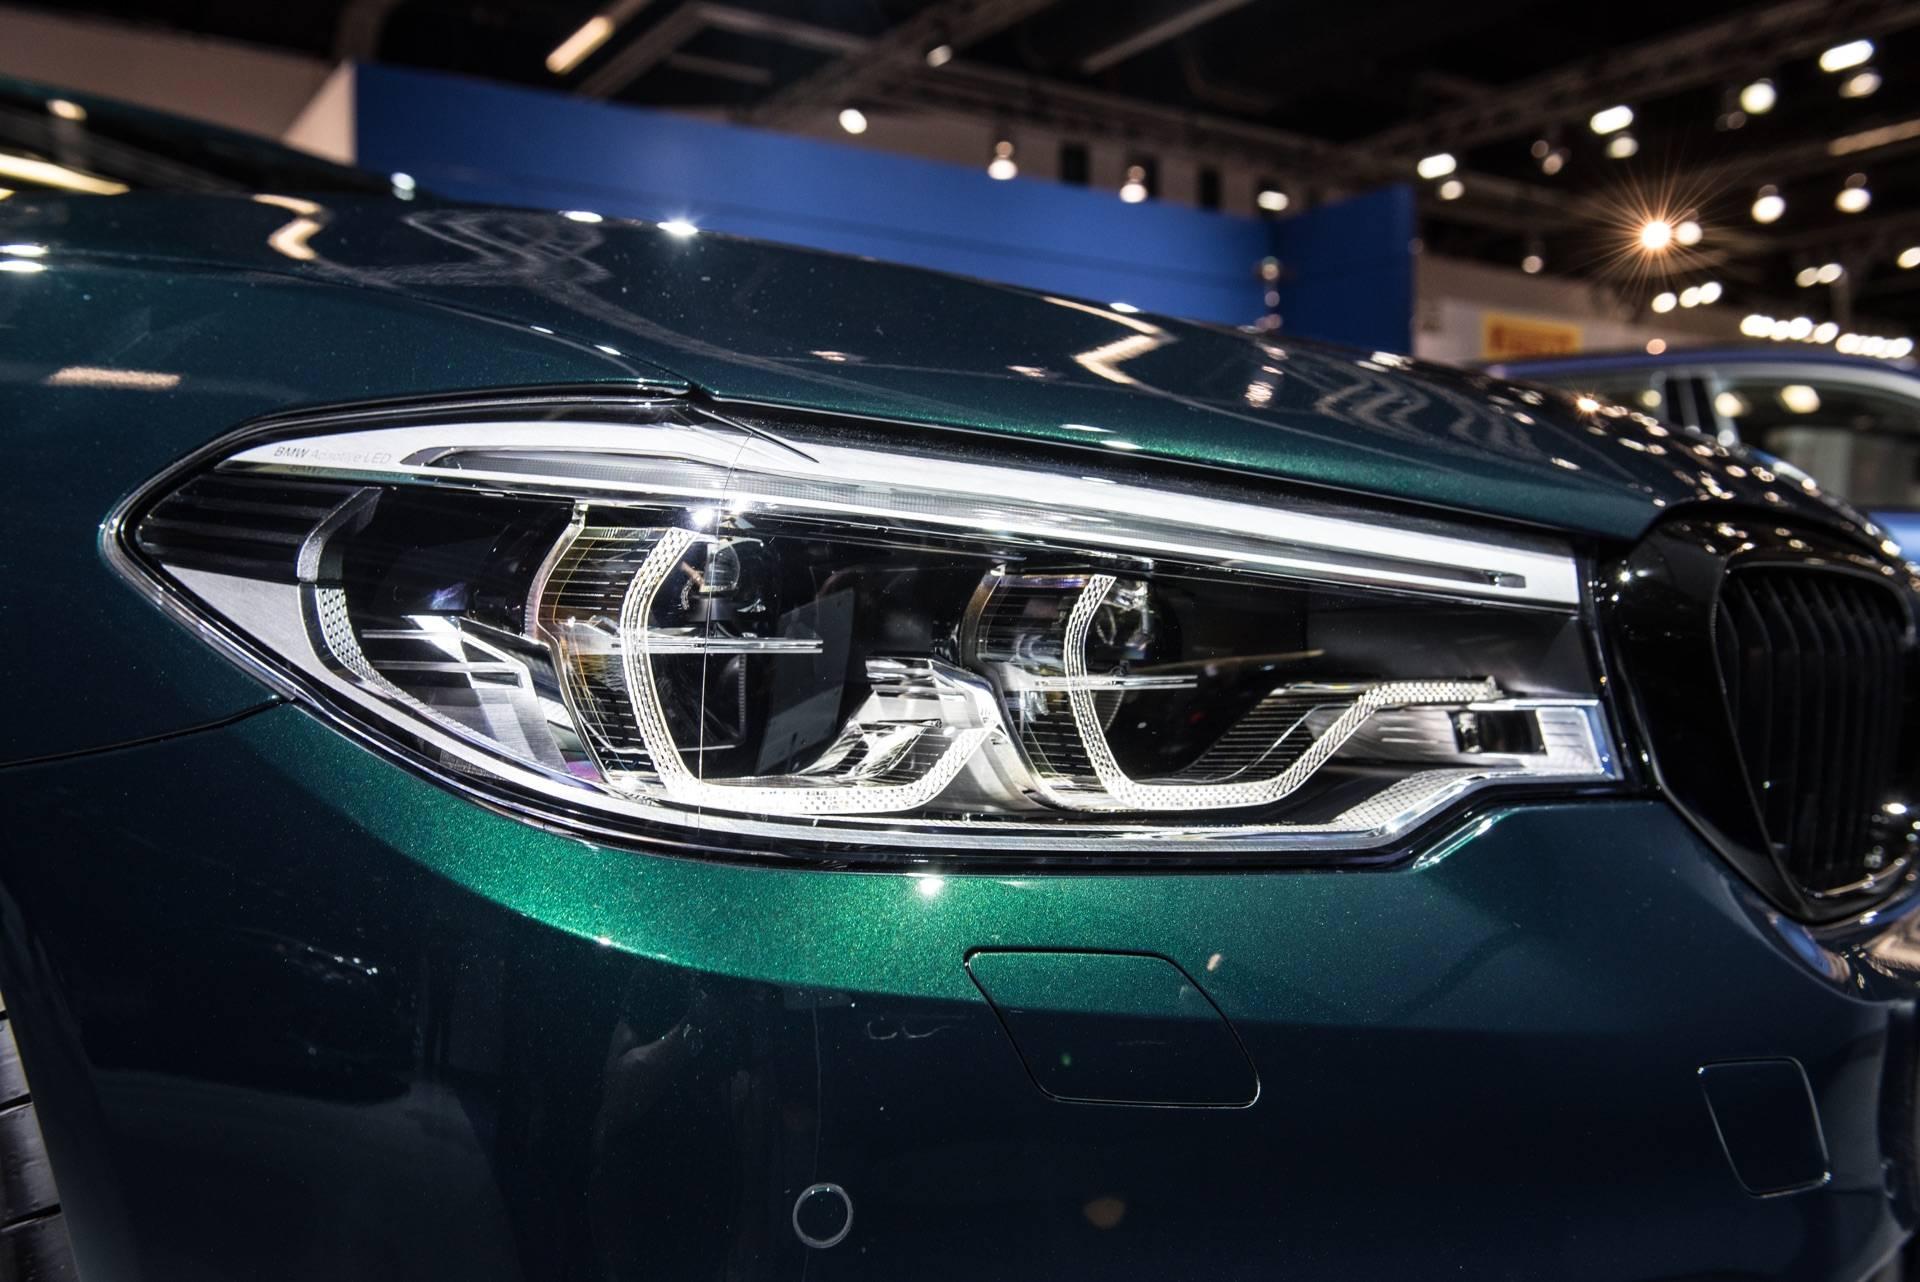 BMW Alpina D5 S детали кузова